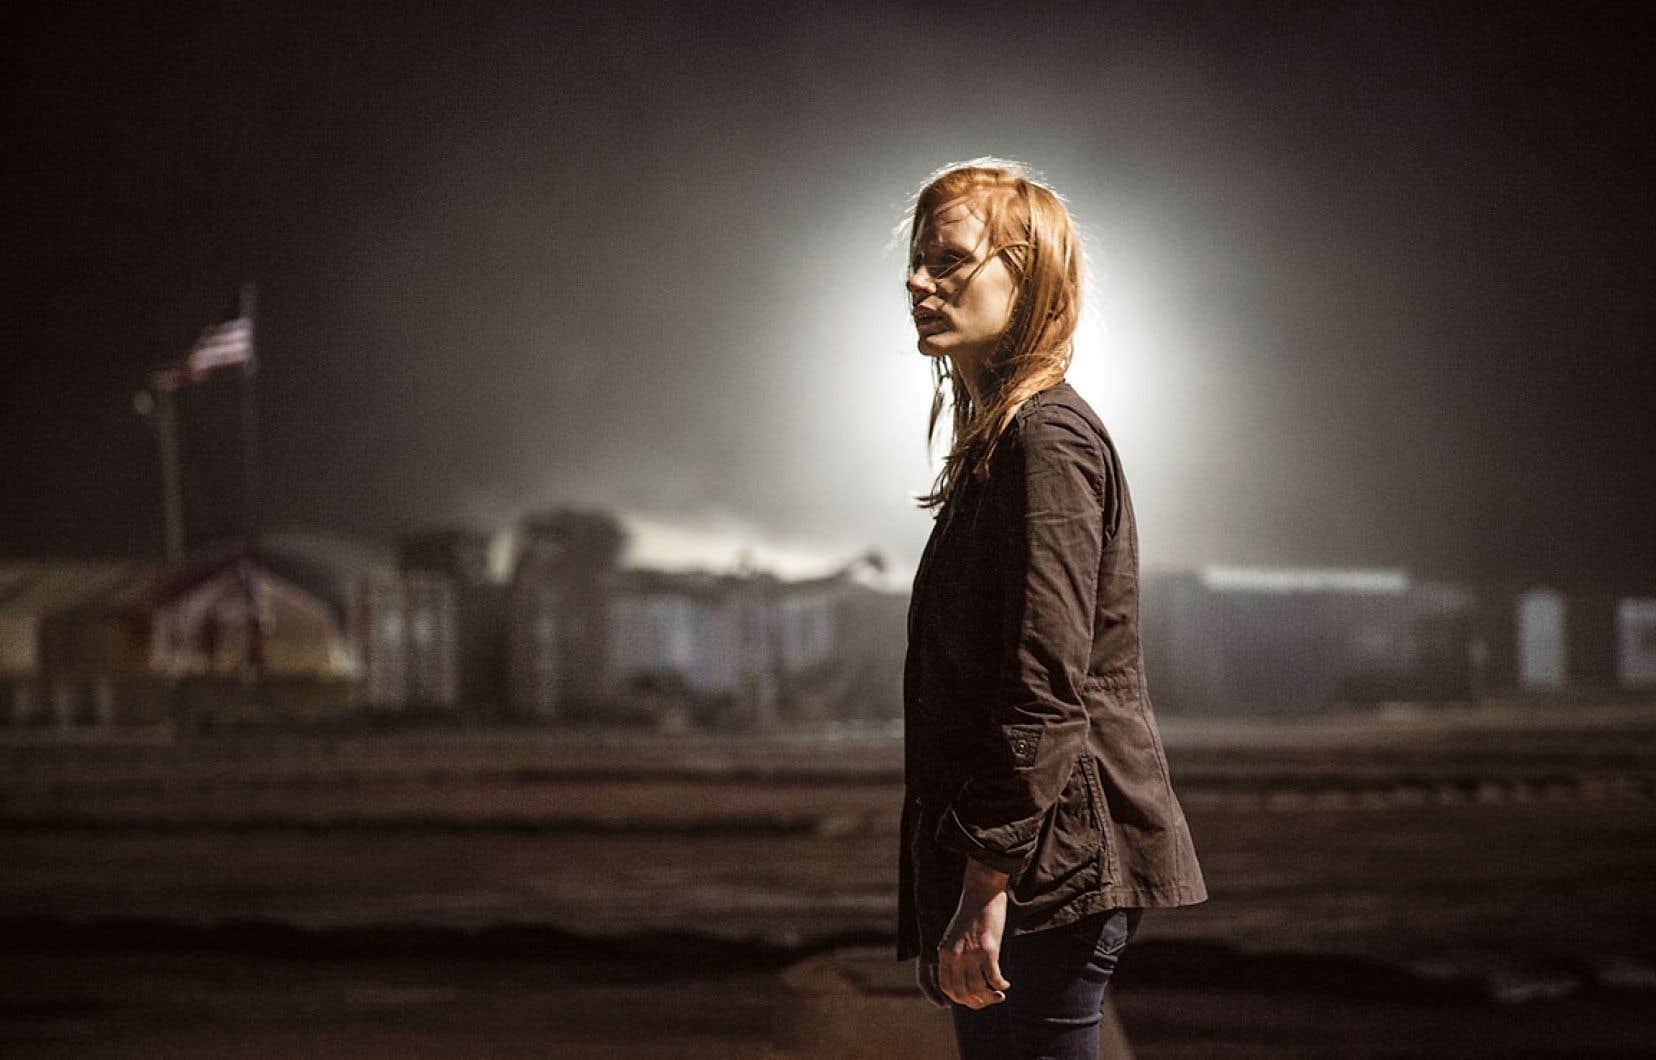 Une scène du film Zero Dark Thirty de Kathryn Bigelow